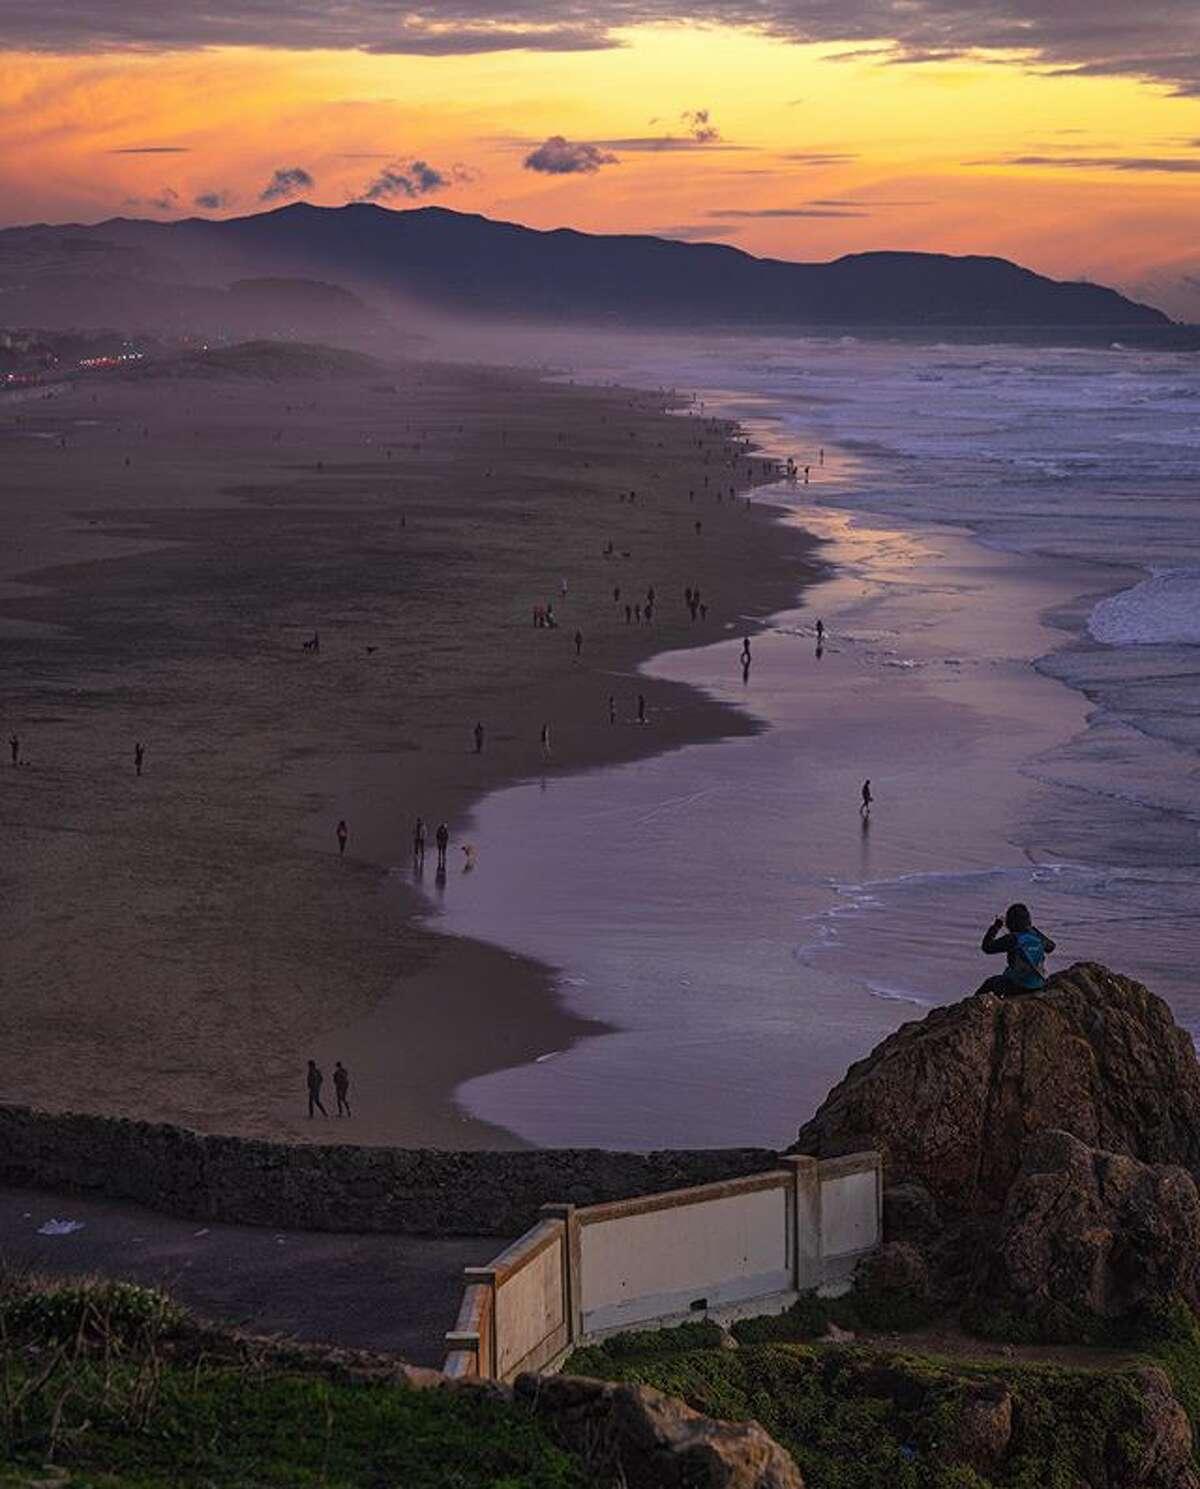 Sunset at Ocean Beach by @sunjay_chopra